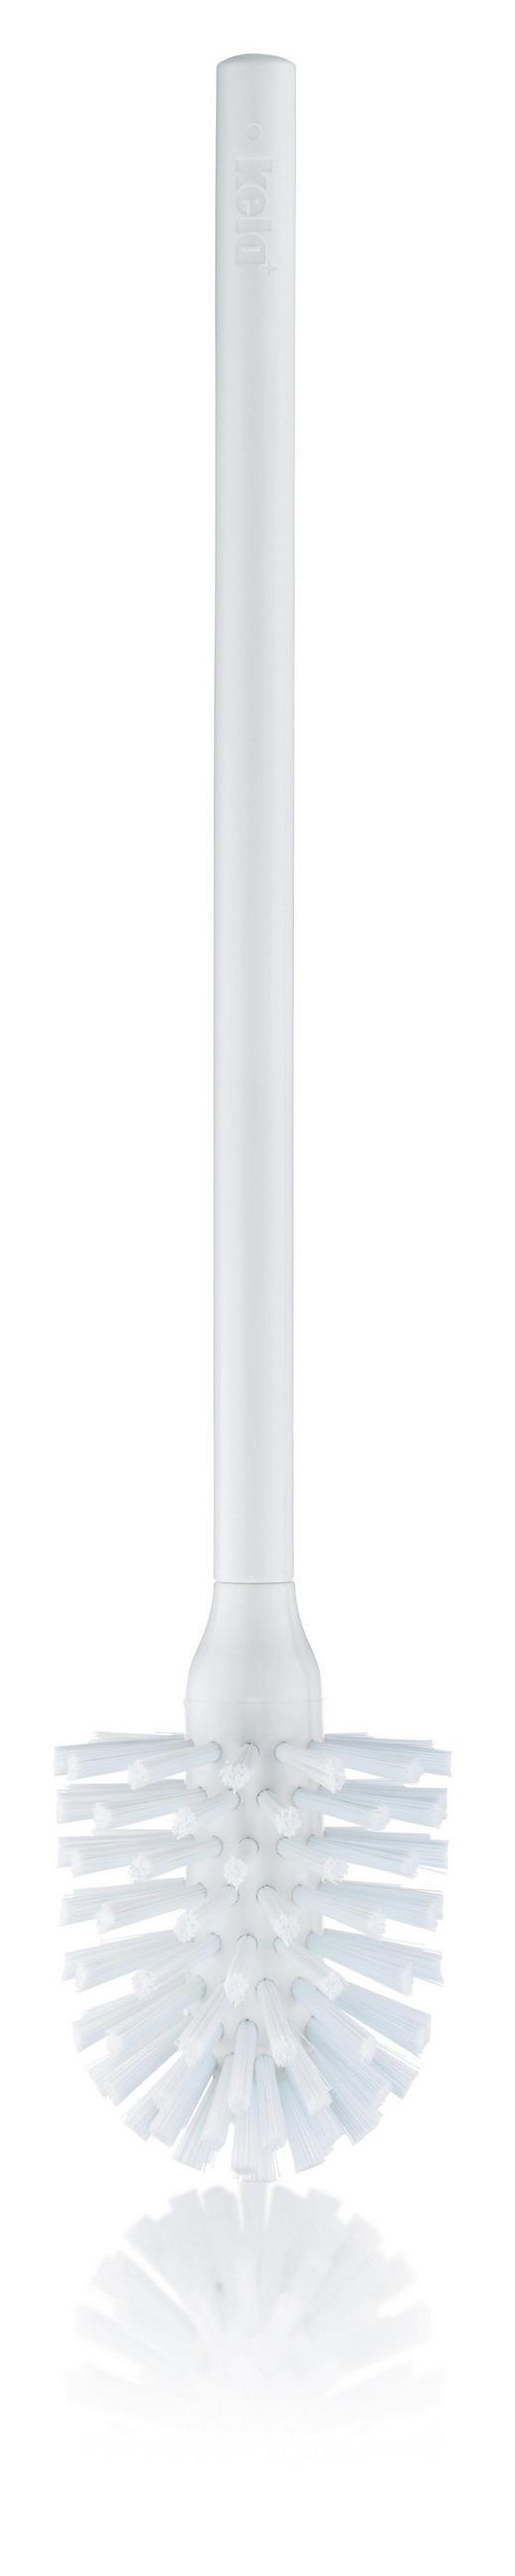 WC-BÜRSTE - Weiß, Basics, Kunststoff (8/42,5cm)